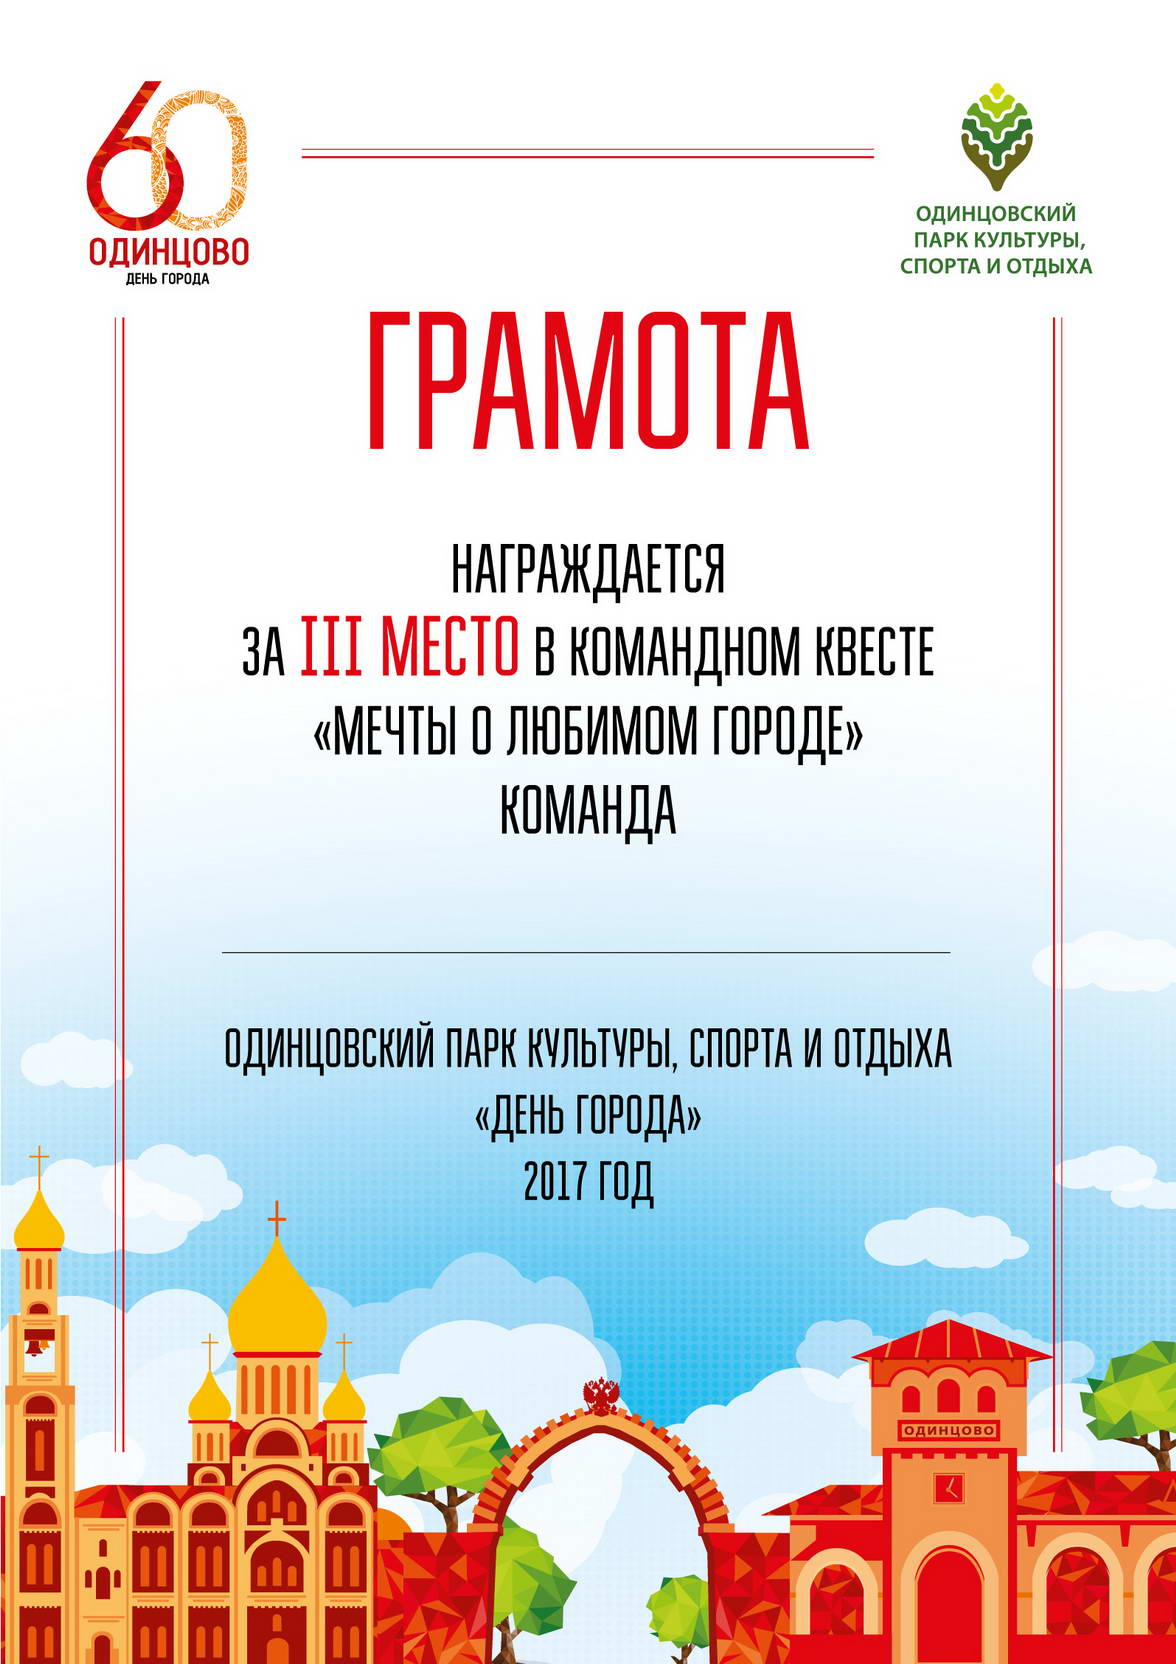 日奥金佐沃 2 сентября дизайн грамоты Одинцовский парк